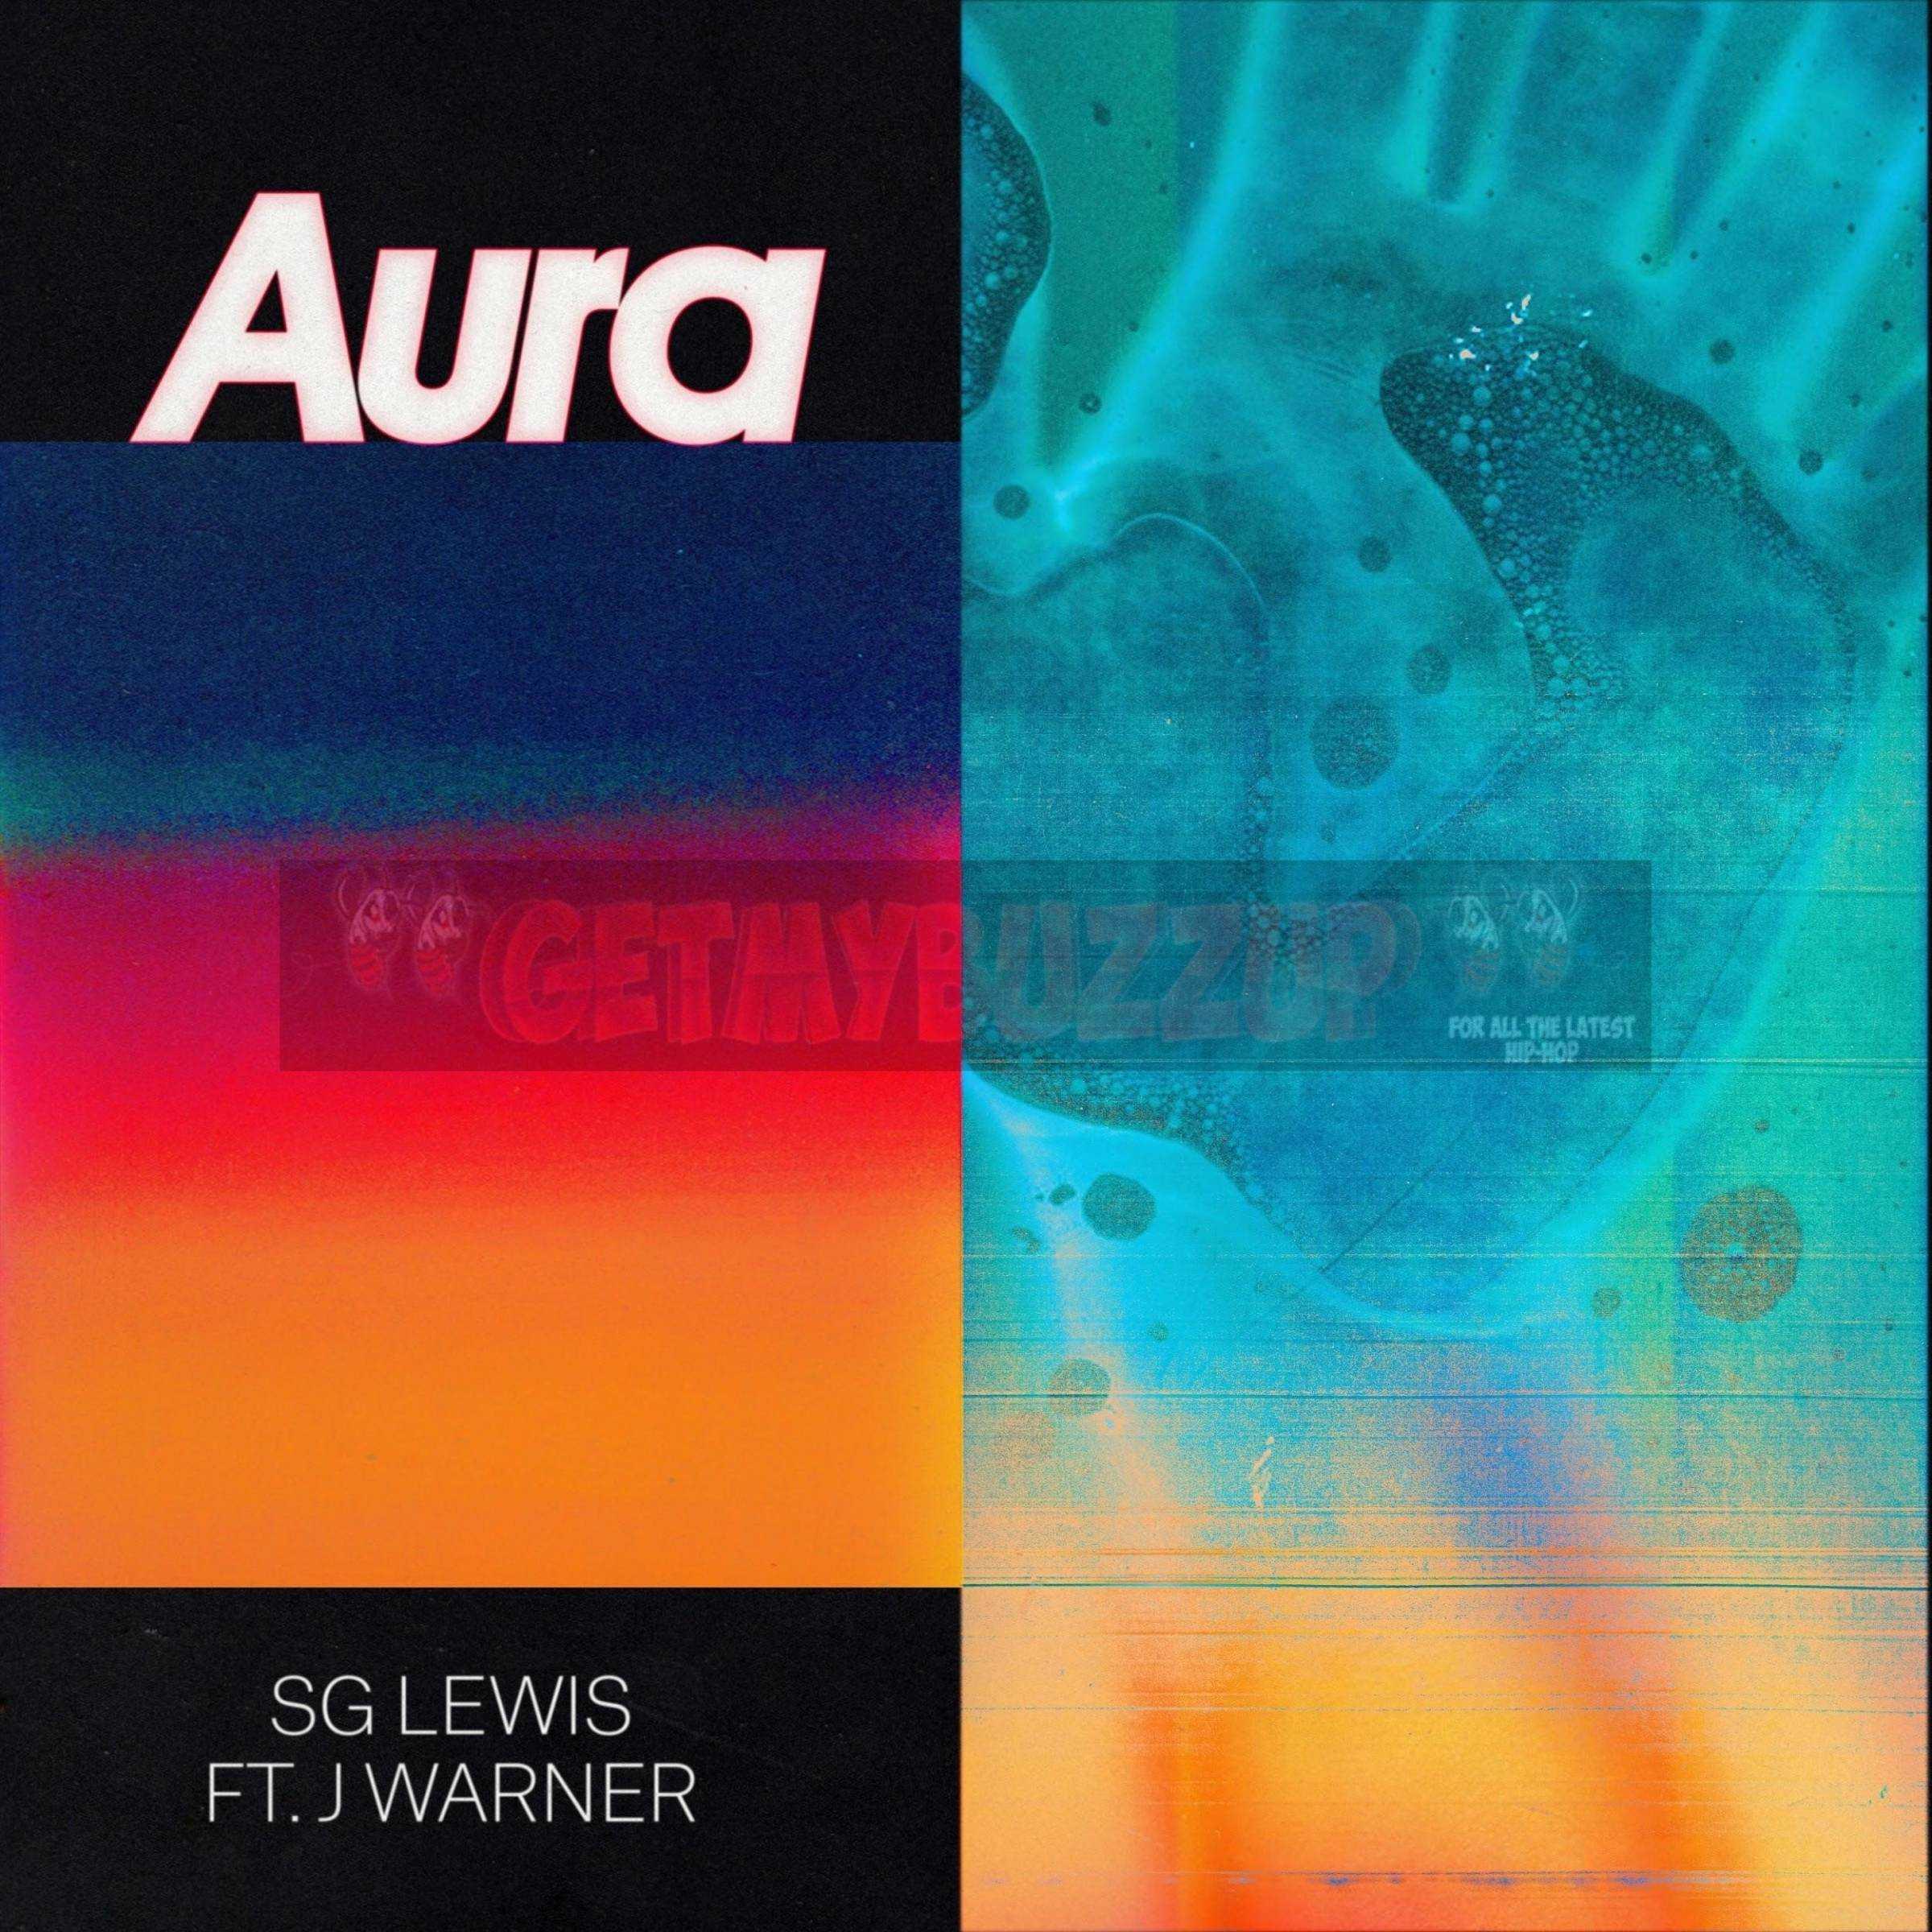 SG LEWIS RELEASES 'AURA' FT. J WARNER [AUDIO]